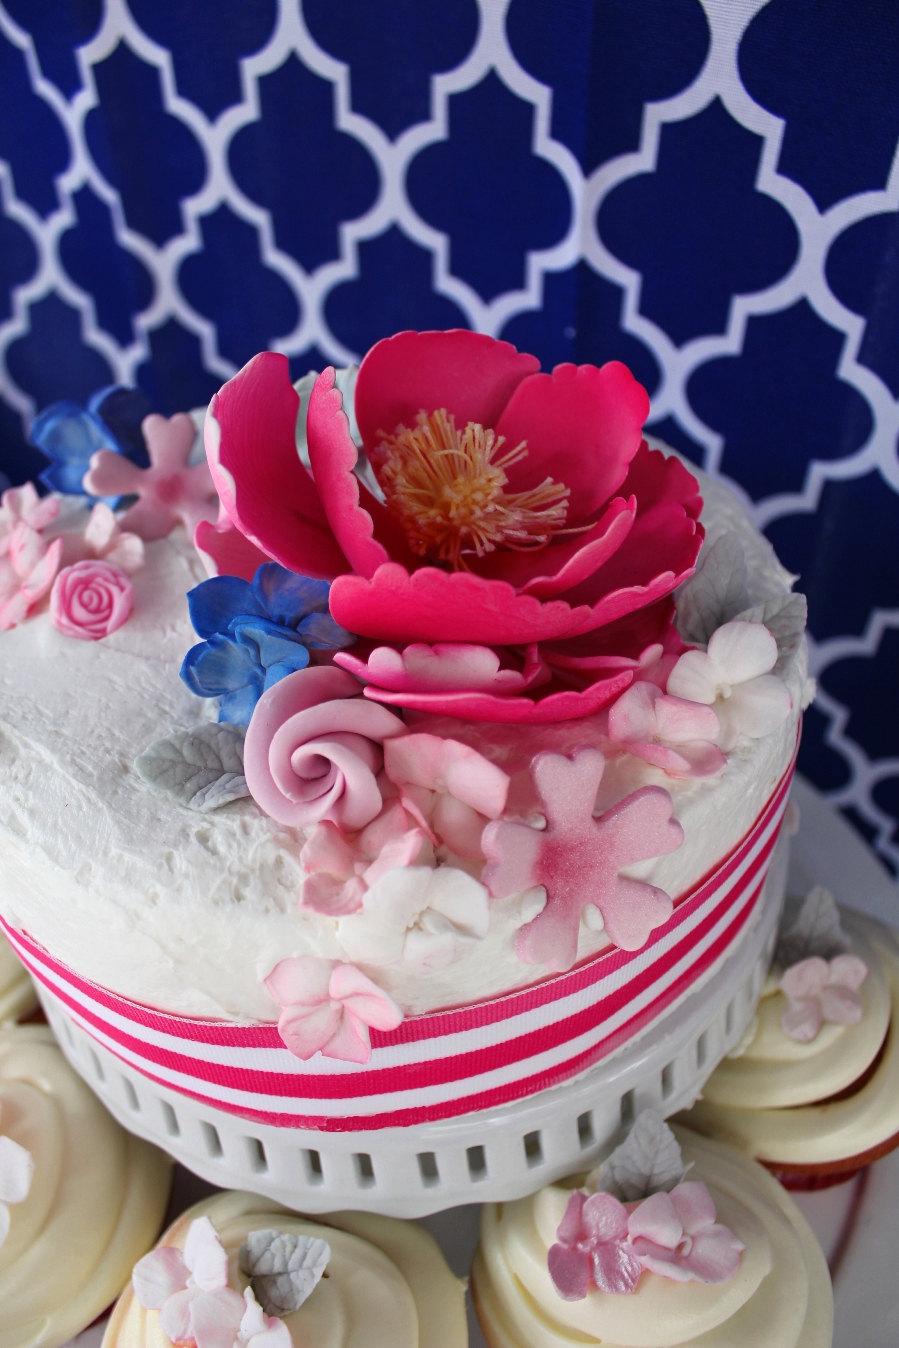 Cake With Fondant Flowers : fondant wedding cake flowers pink peonies OneWed.com